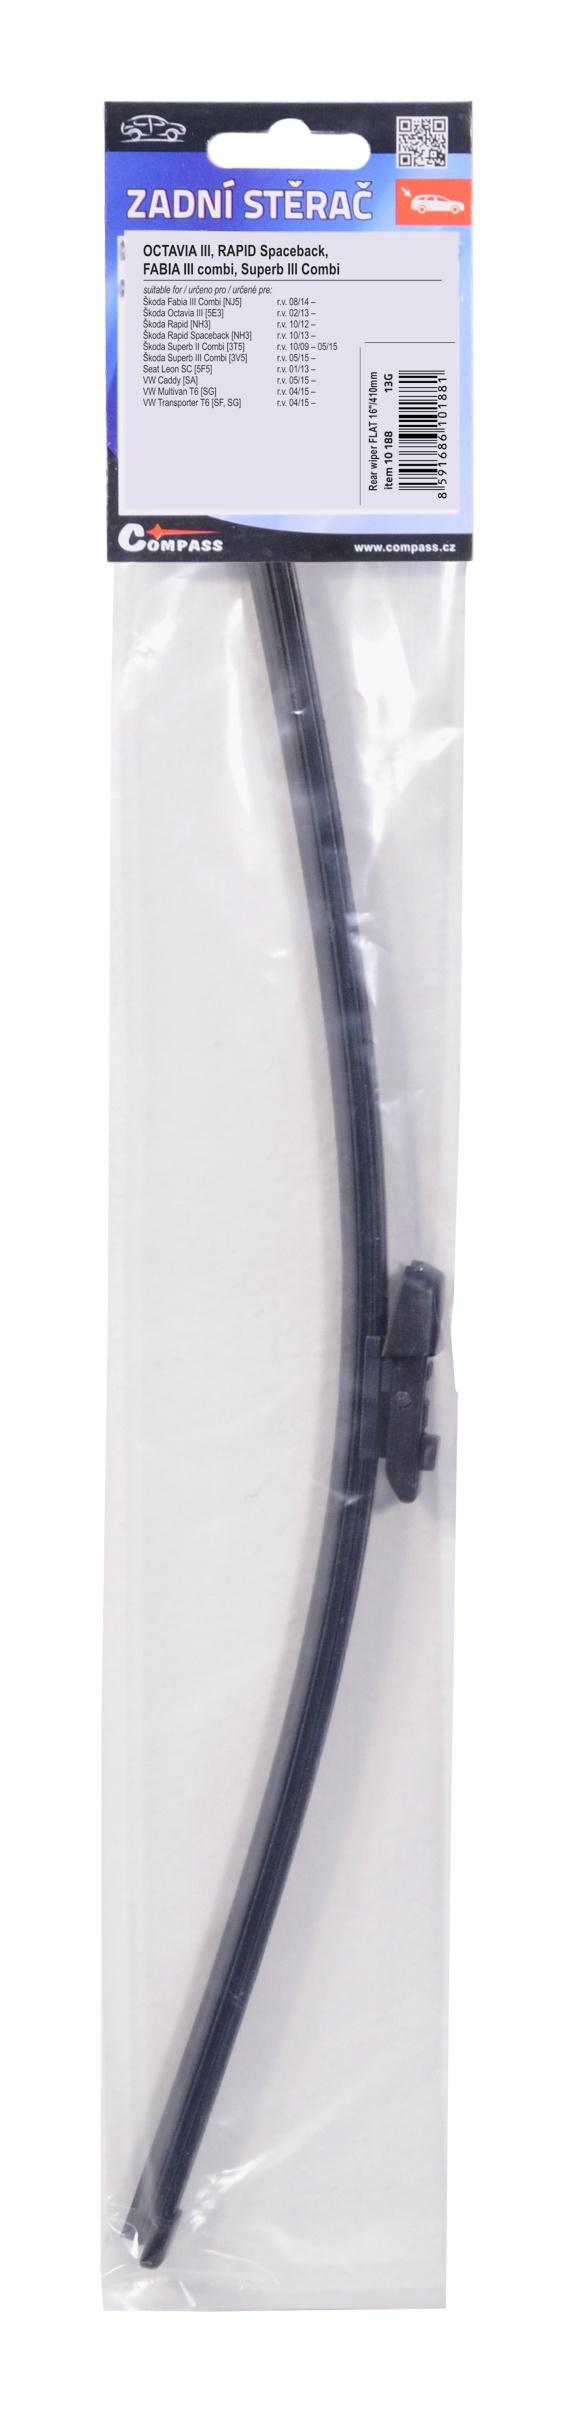 "Stěrač zadní FLAT 16""/400mm OCT3 / RAP spac / FAB3 comb / SUP3 comb"